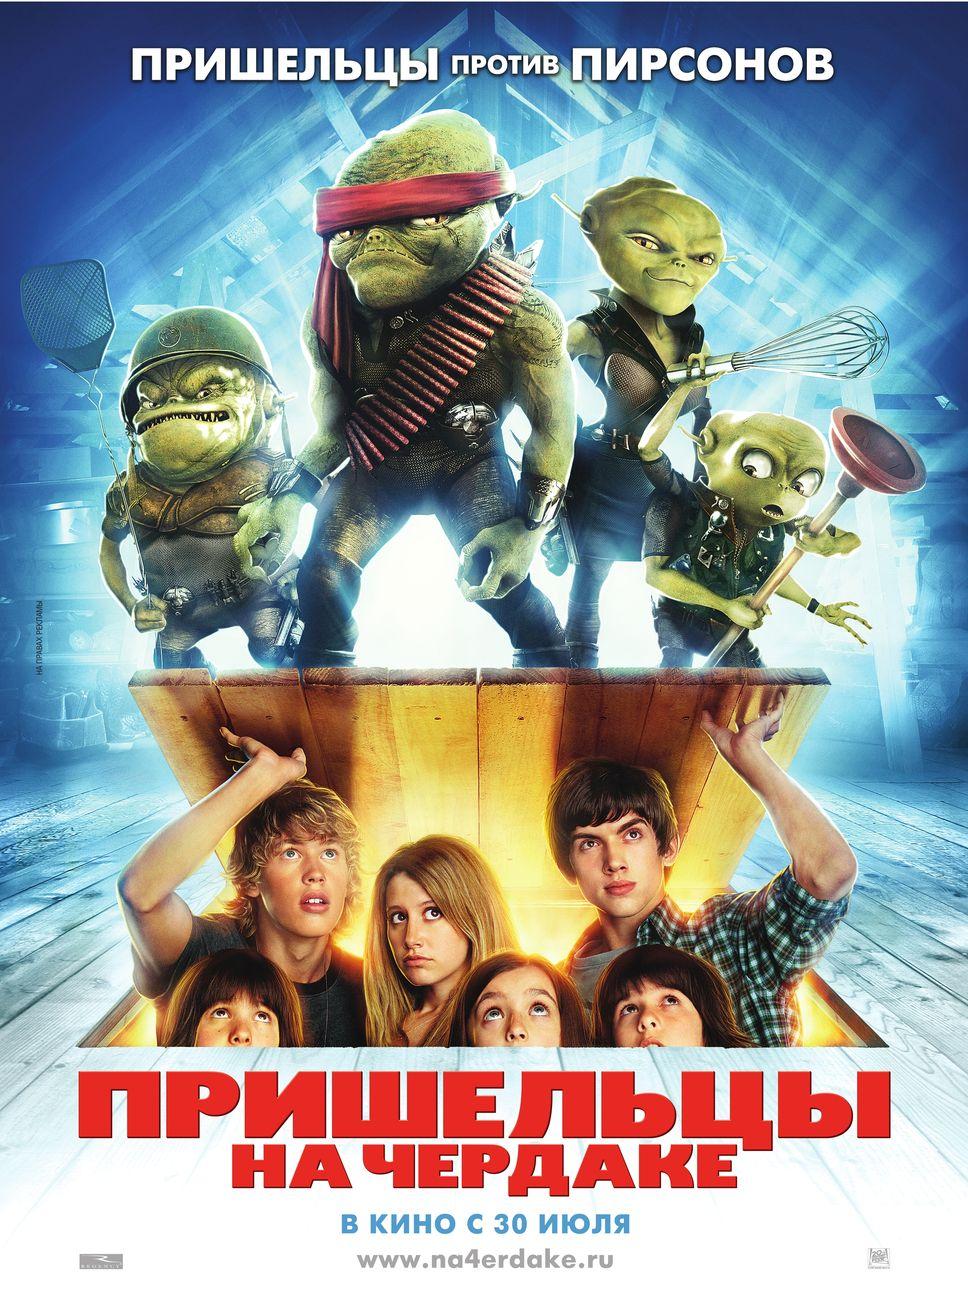 http://www.kinopoisk.ru/images/poster/953135.jpg